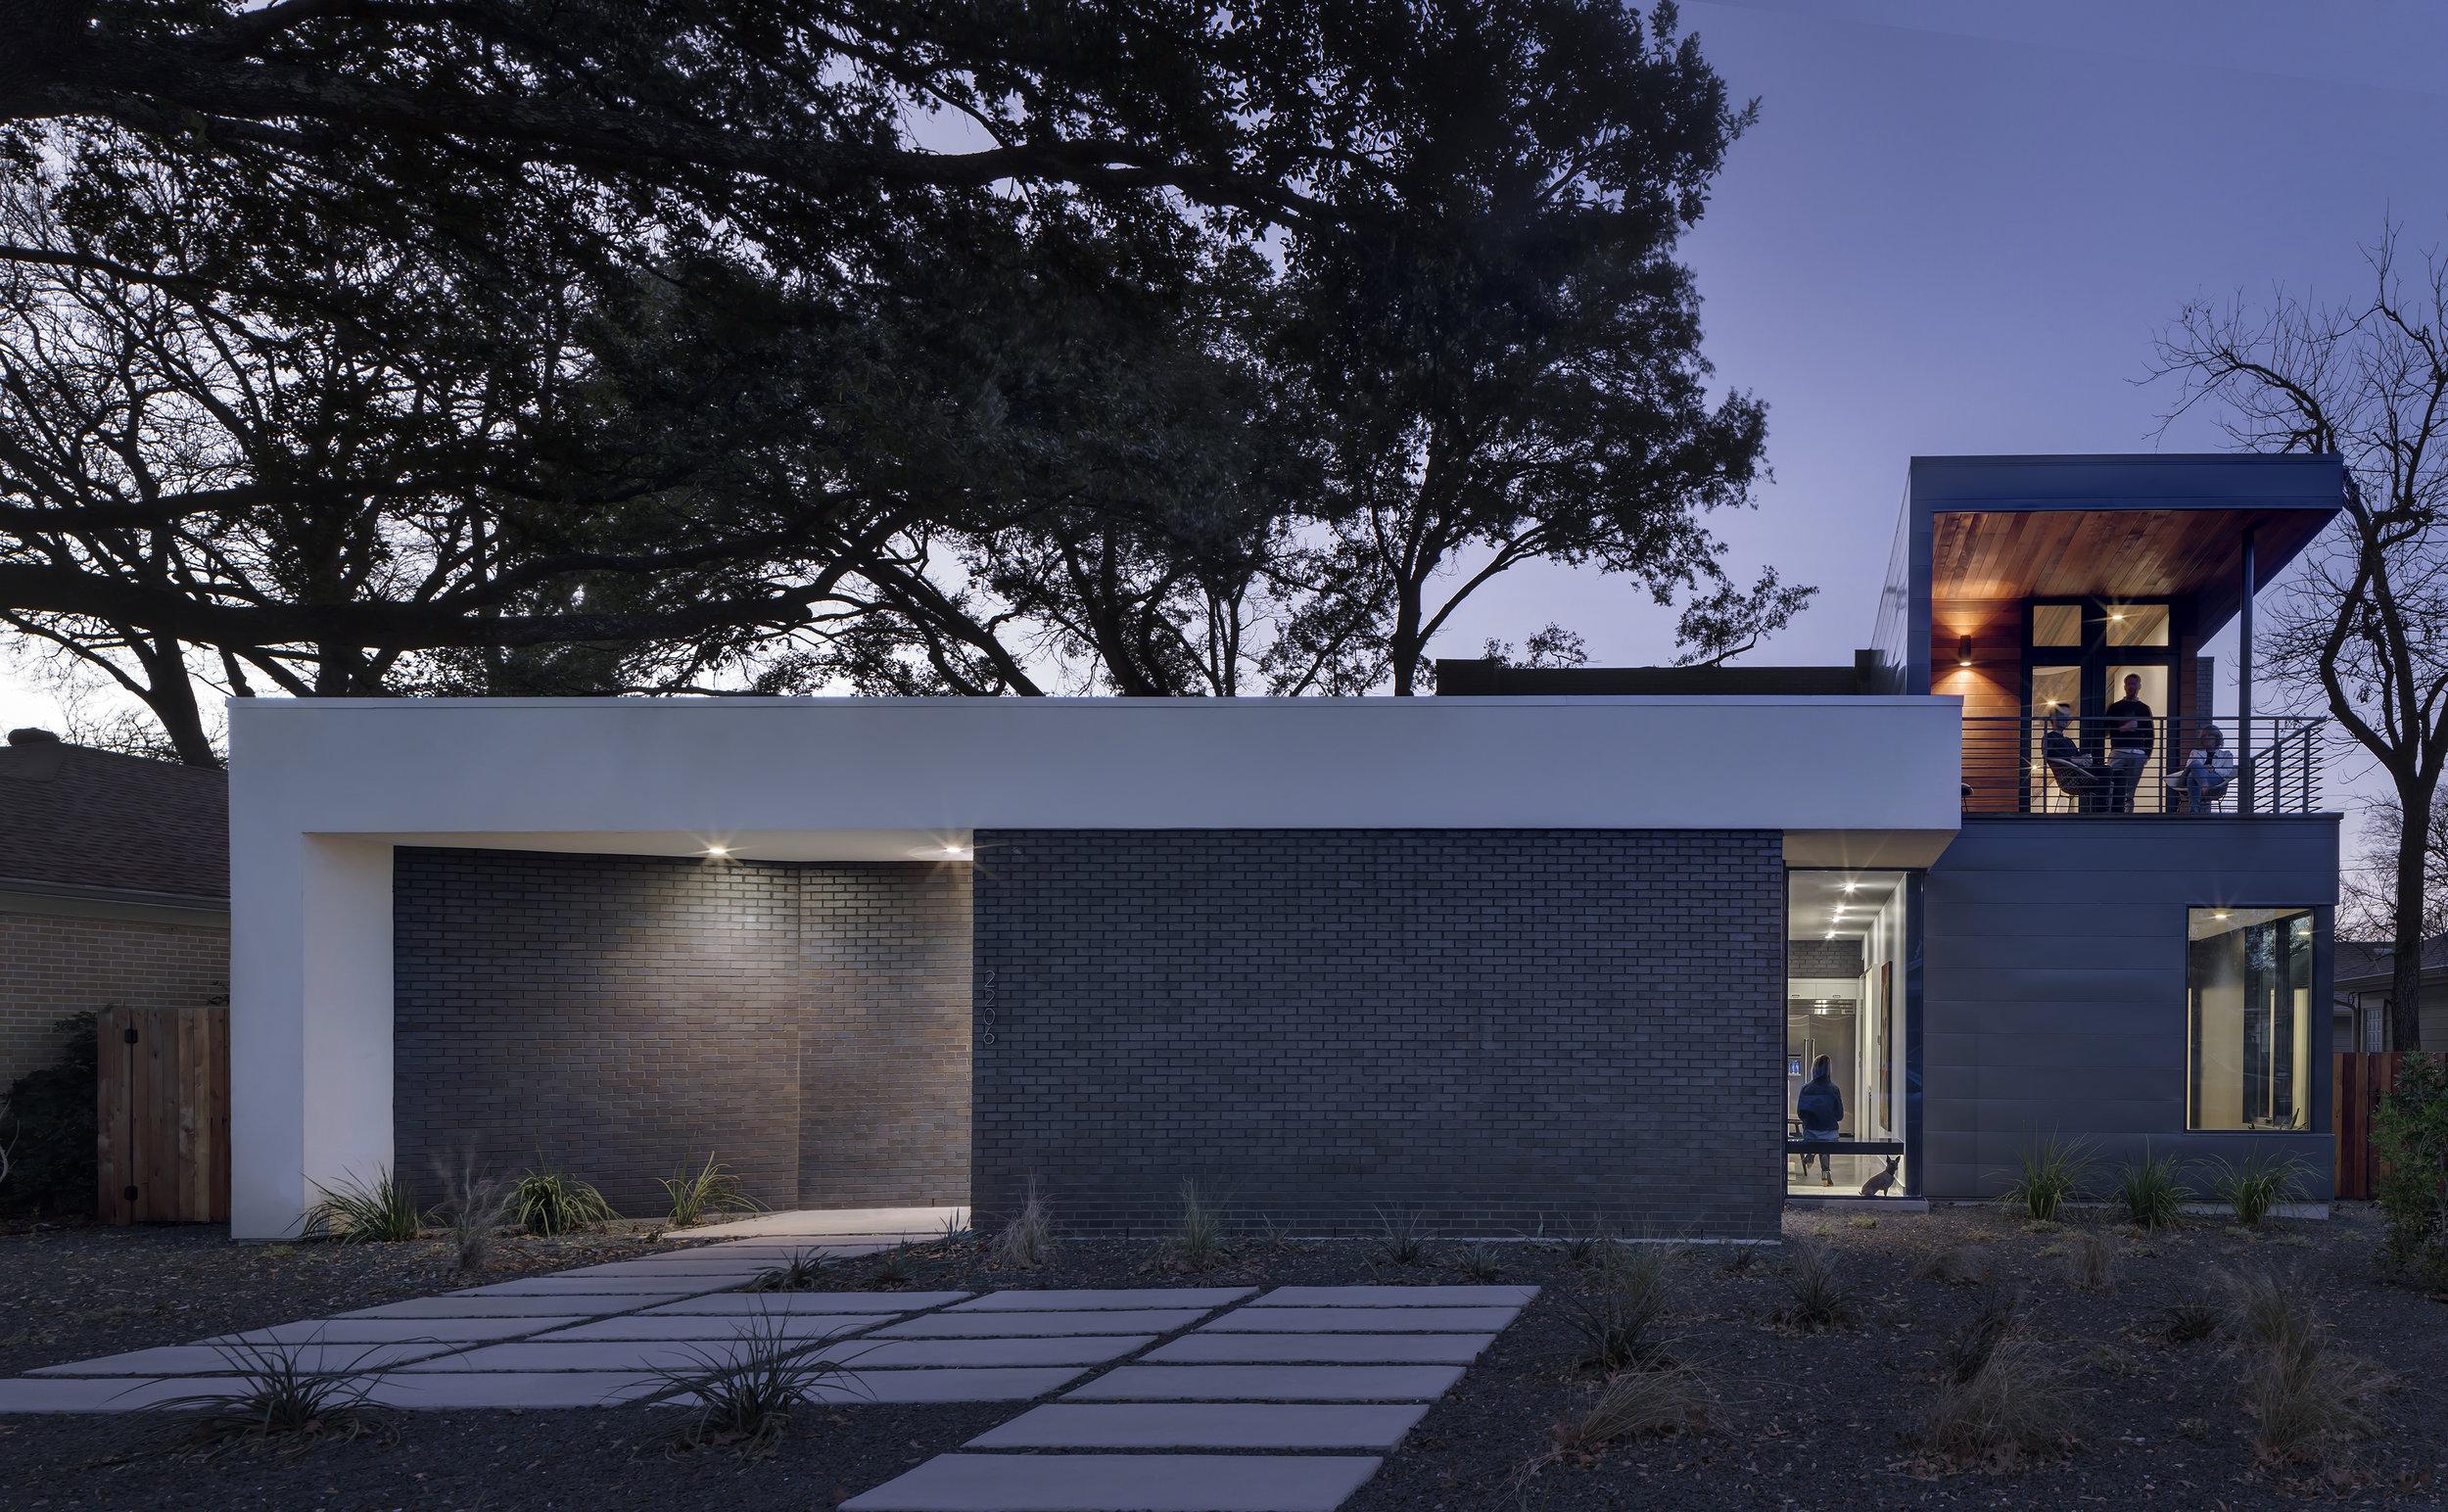 24 Matt Fajkus Architecture - Main Stay House Photo by Charles Davis Smith Front Facade.jpg